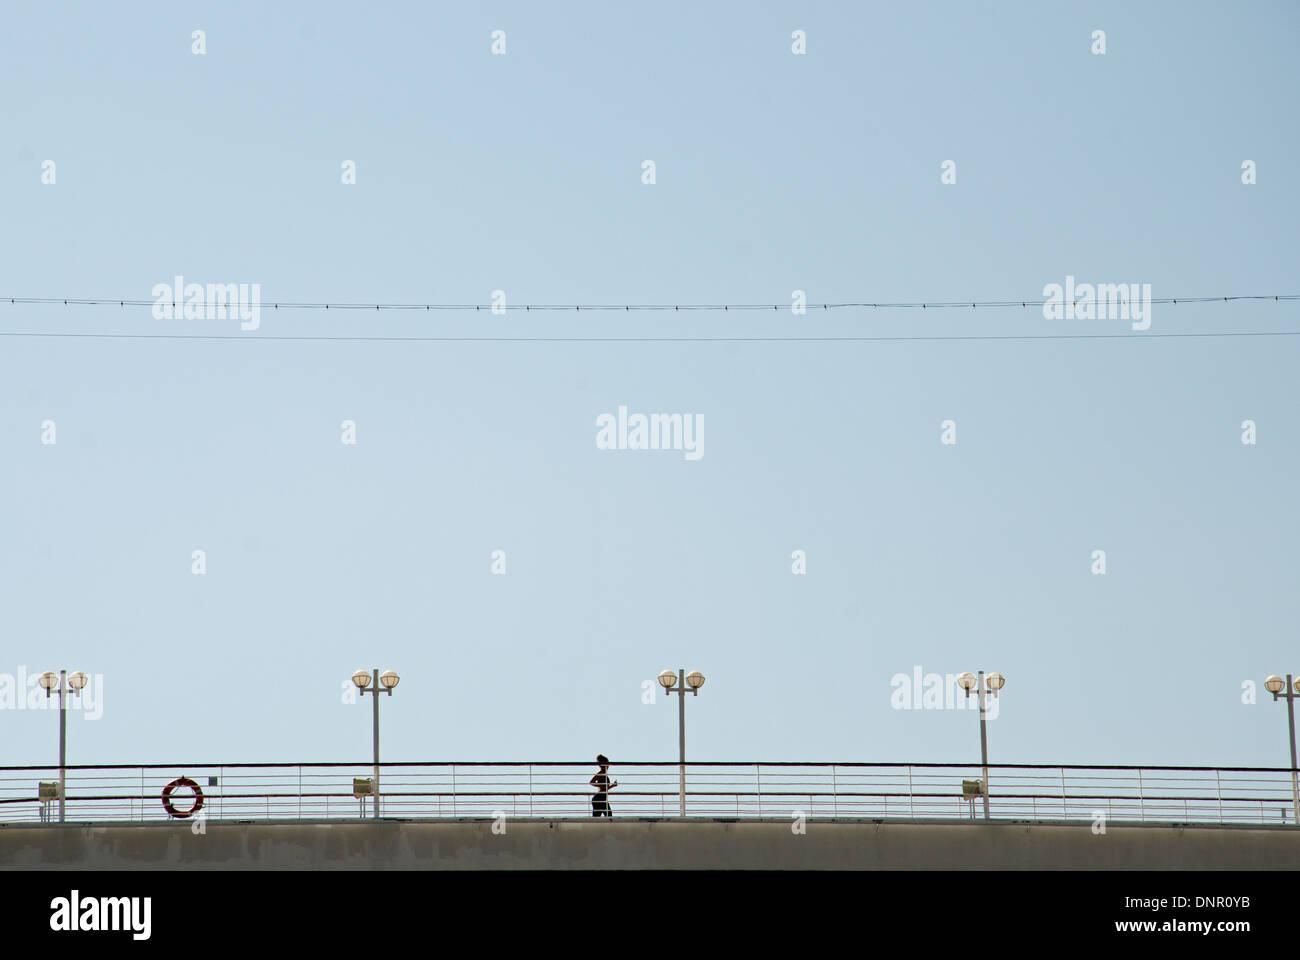 jogging on board Stock Photo